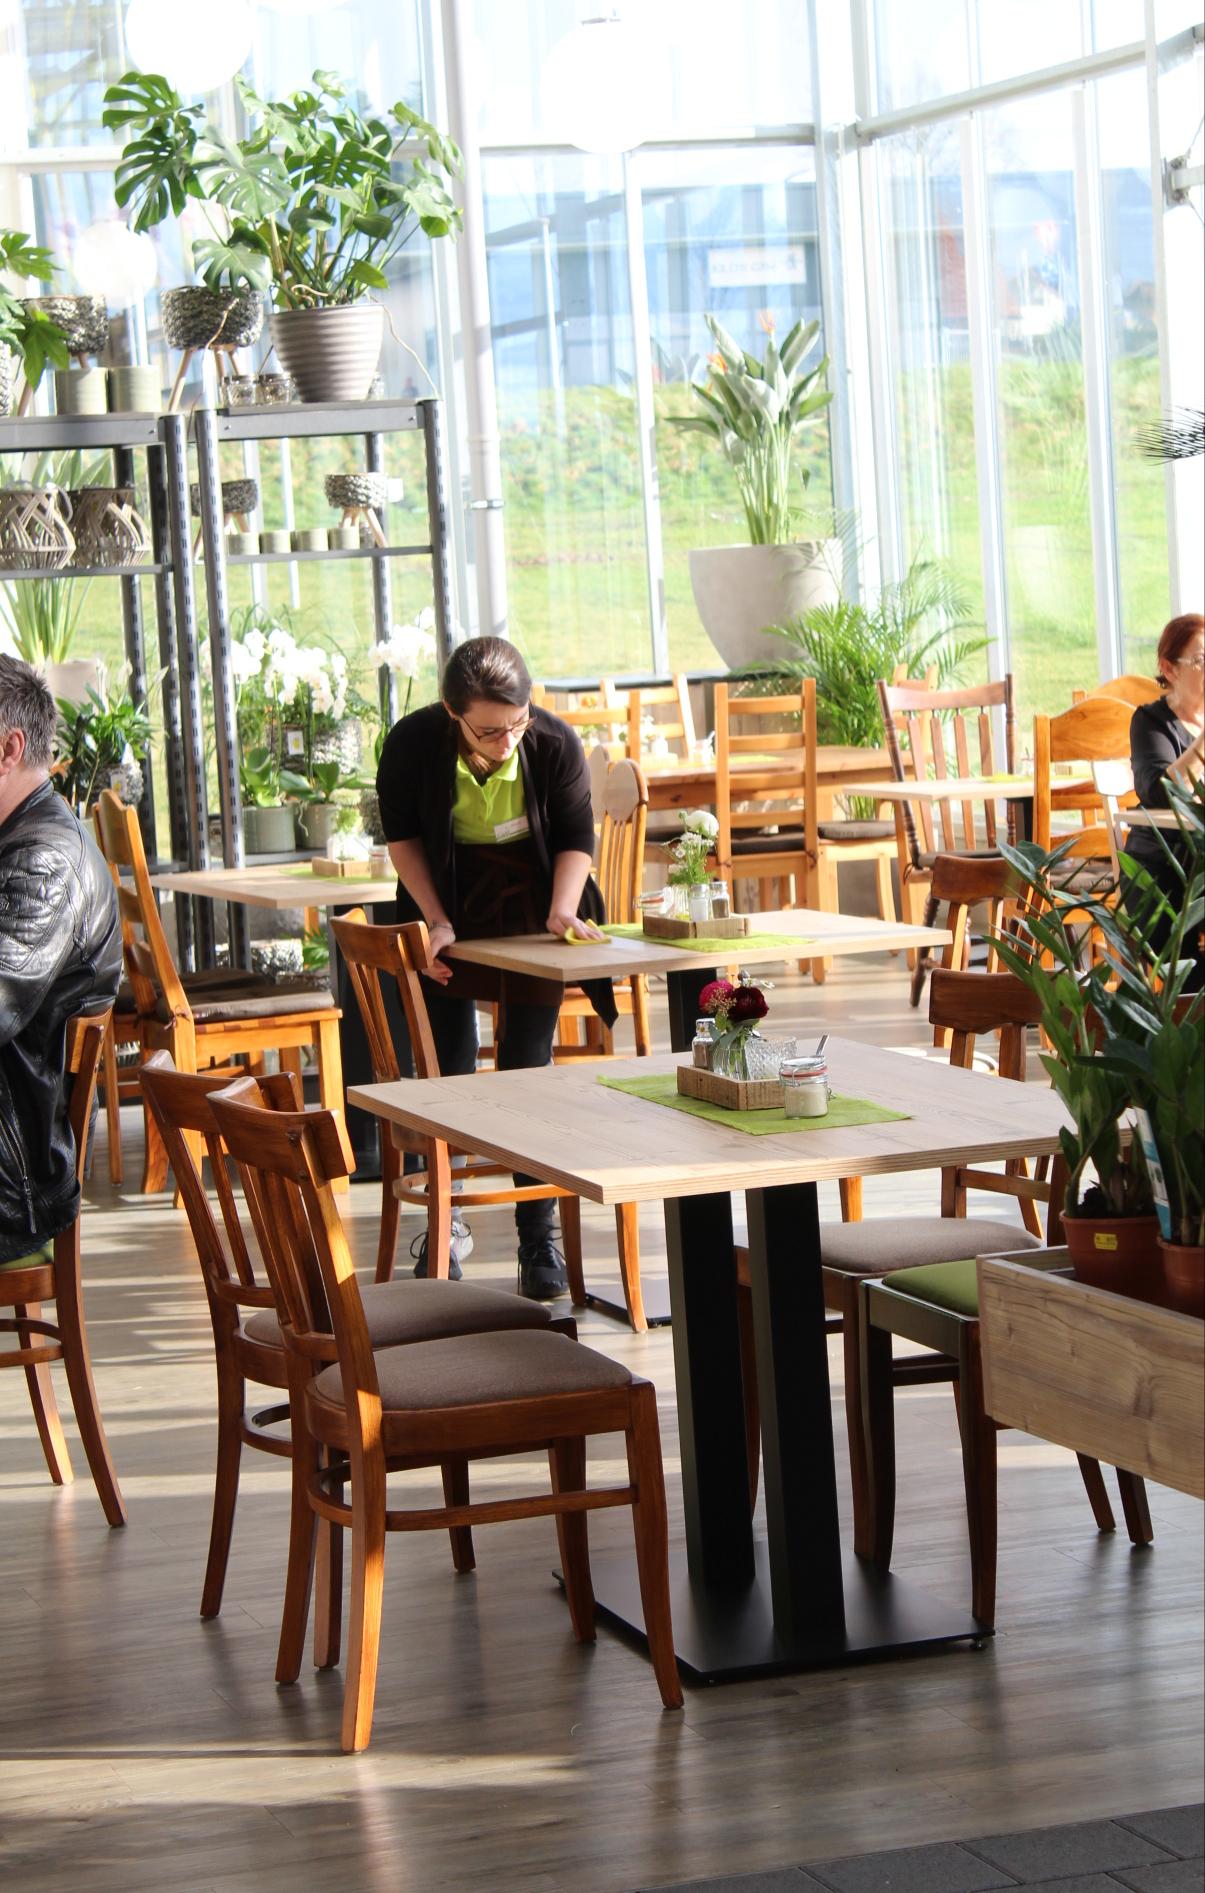 Cafe Immergrün